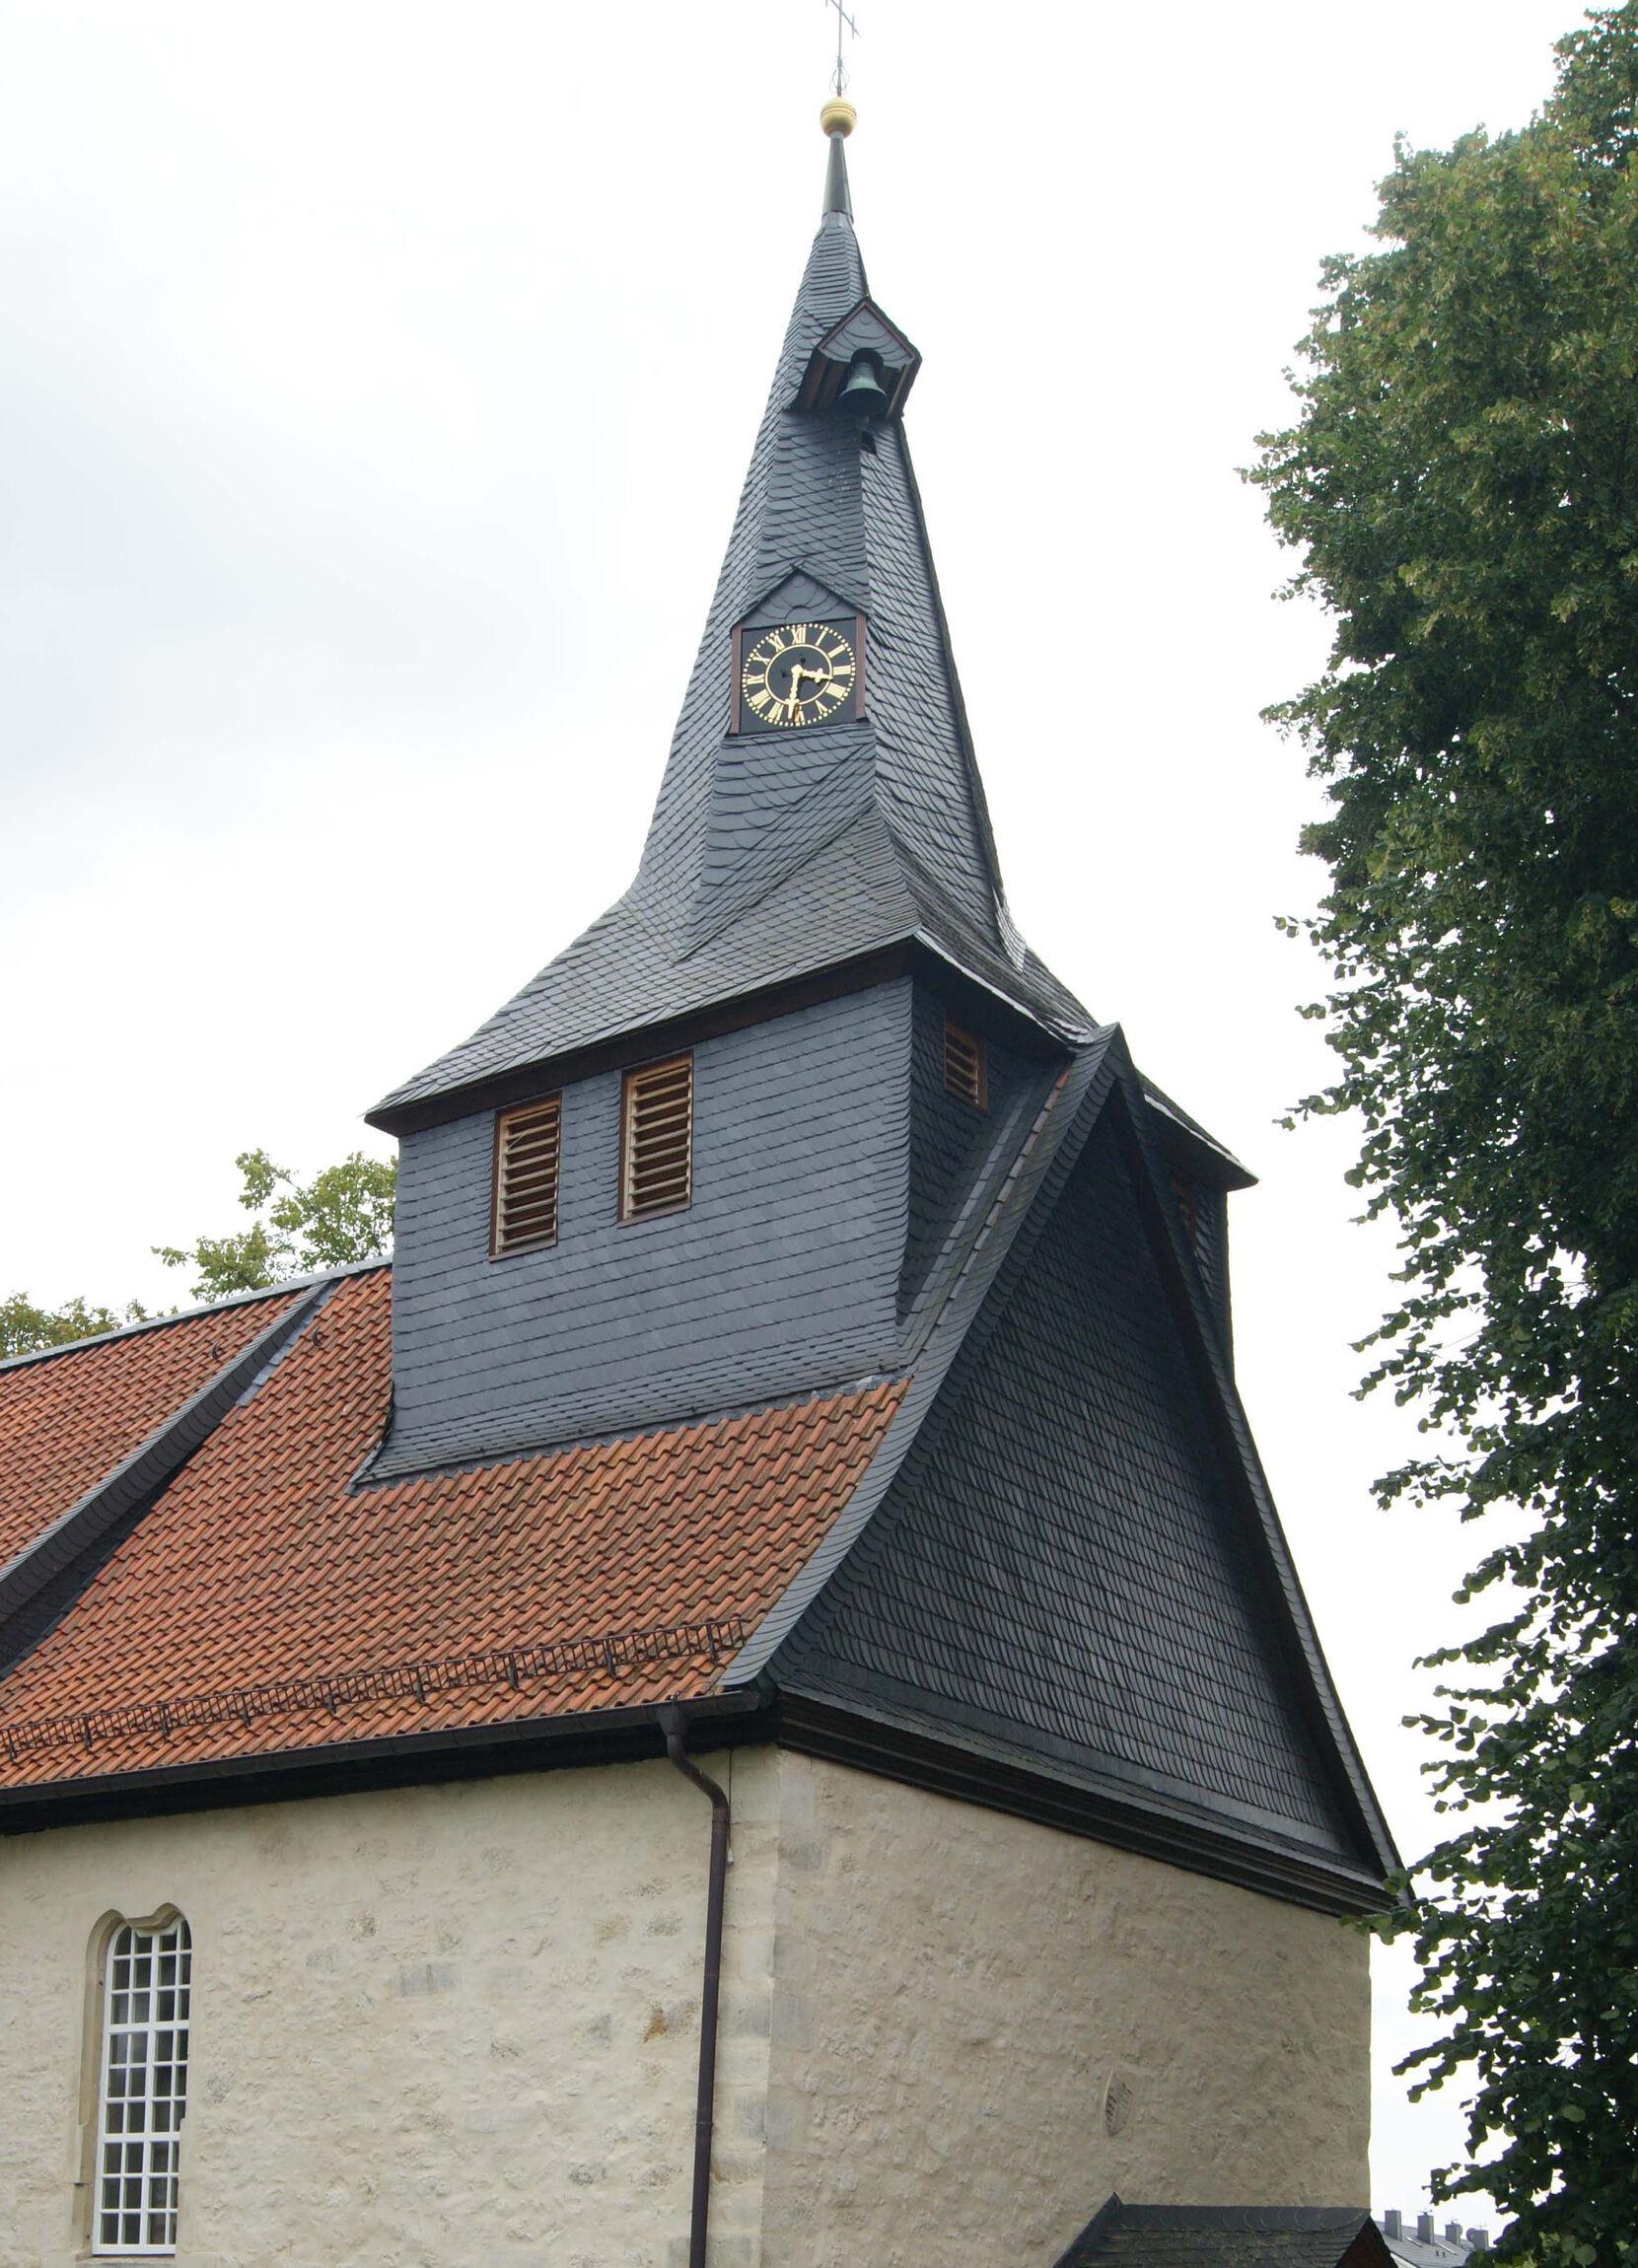 St. Nicolai in Bolzum